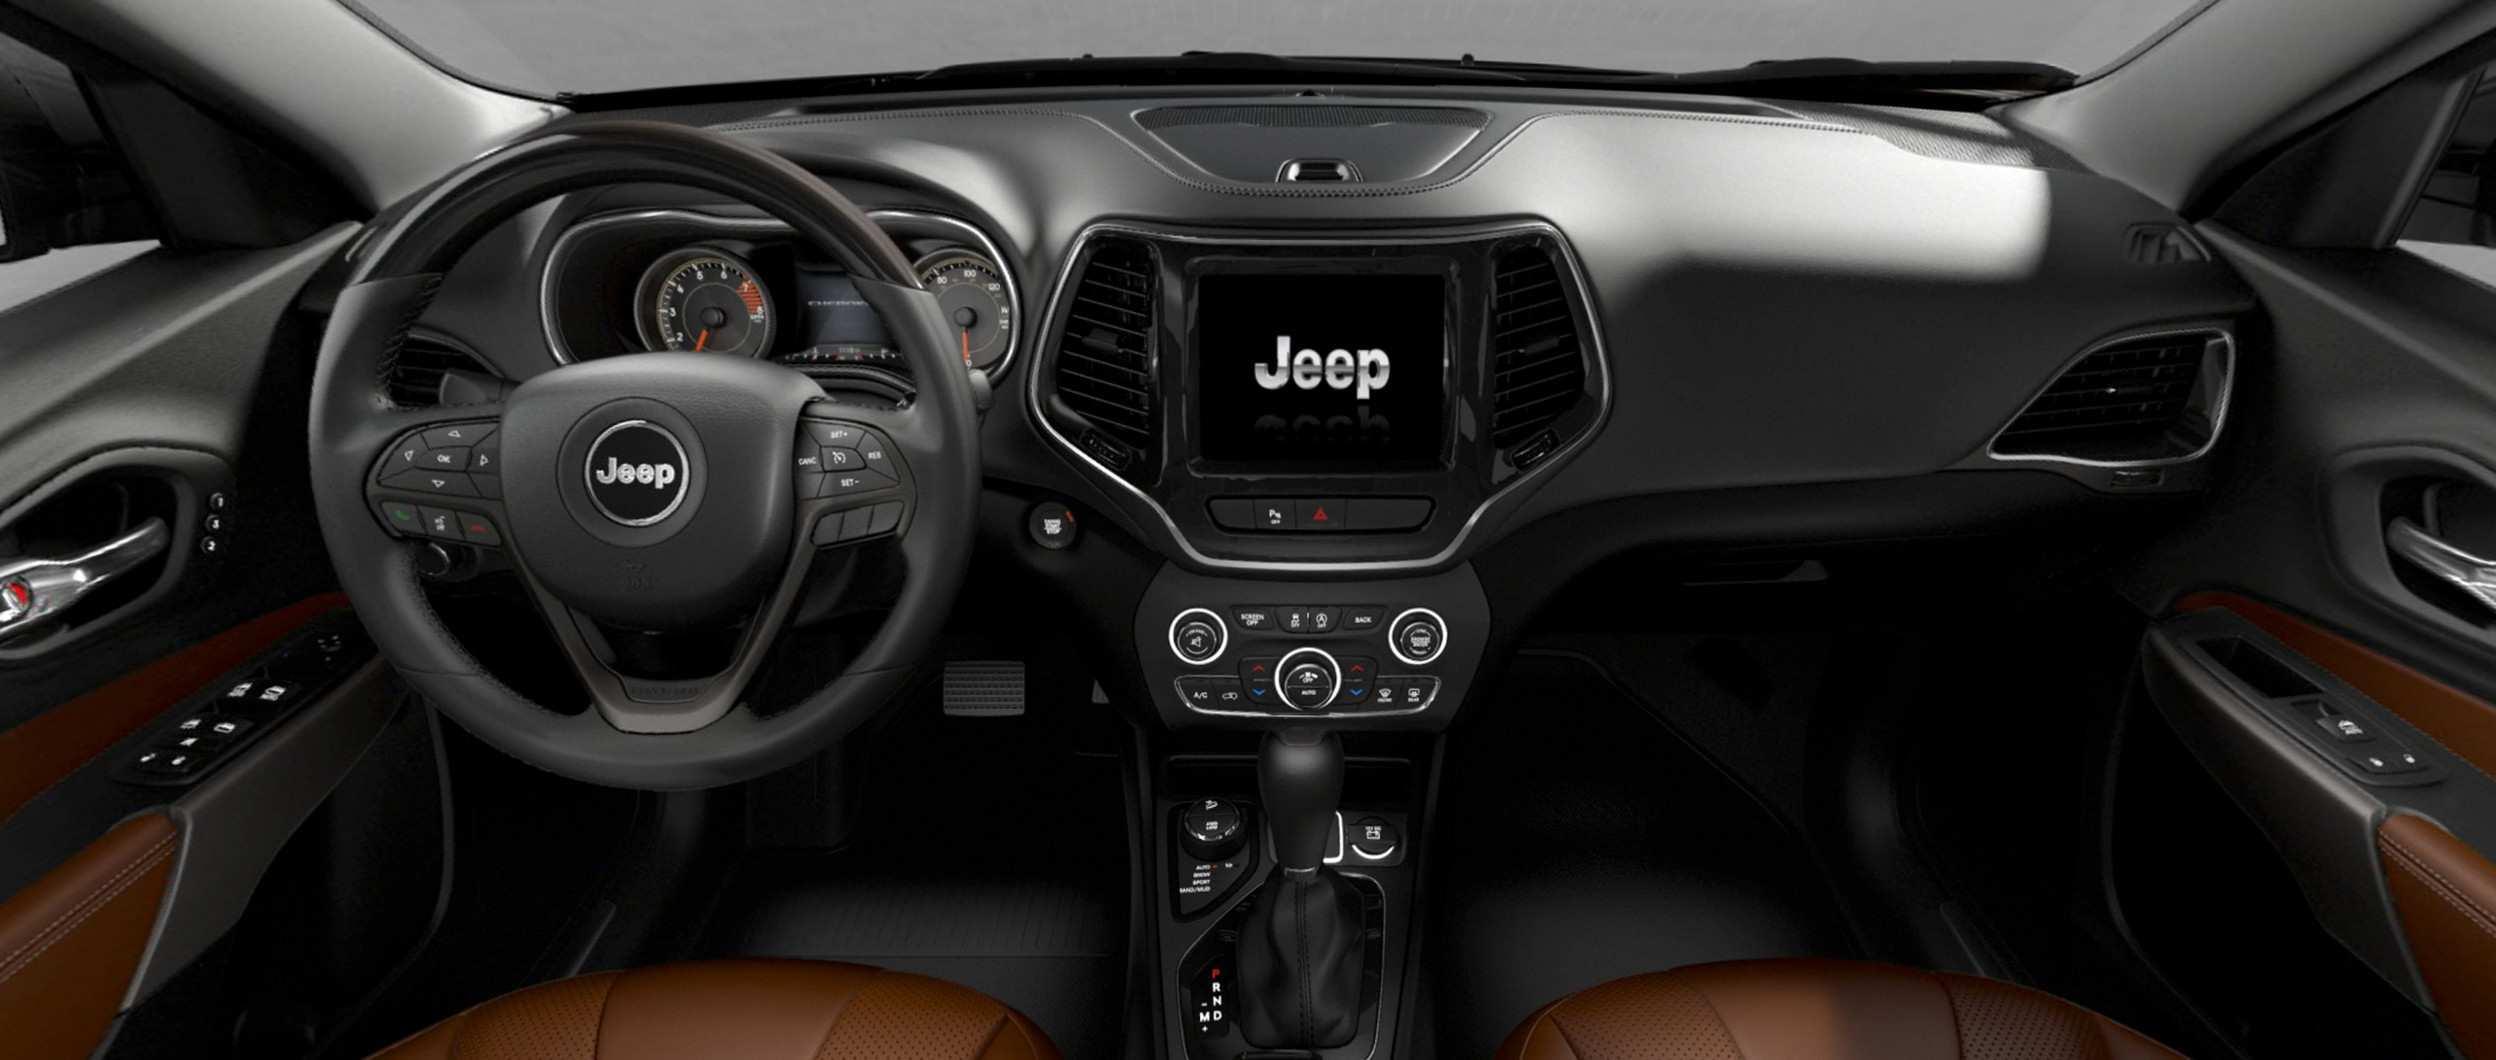 61 Best Review Jeep Turbo Diesel 2019 Interior Engine with Jeep Turbo Diesel 2019 Interior